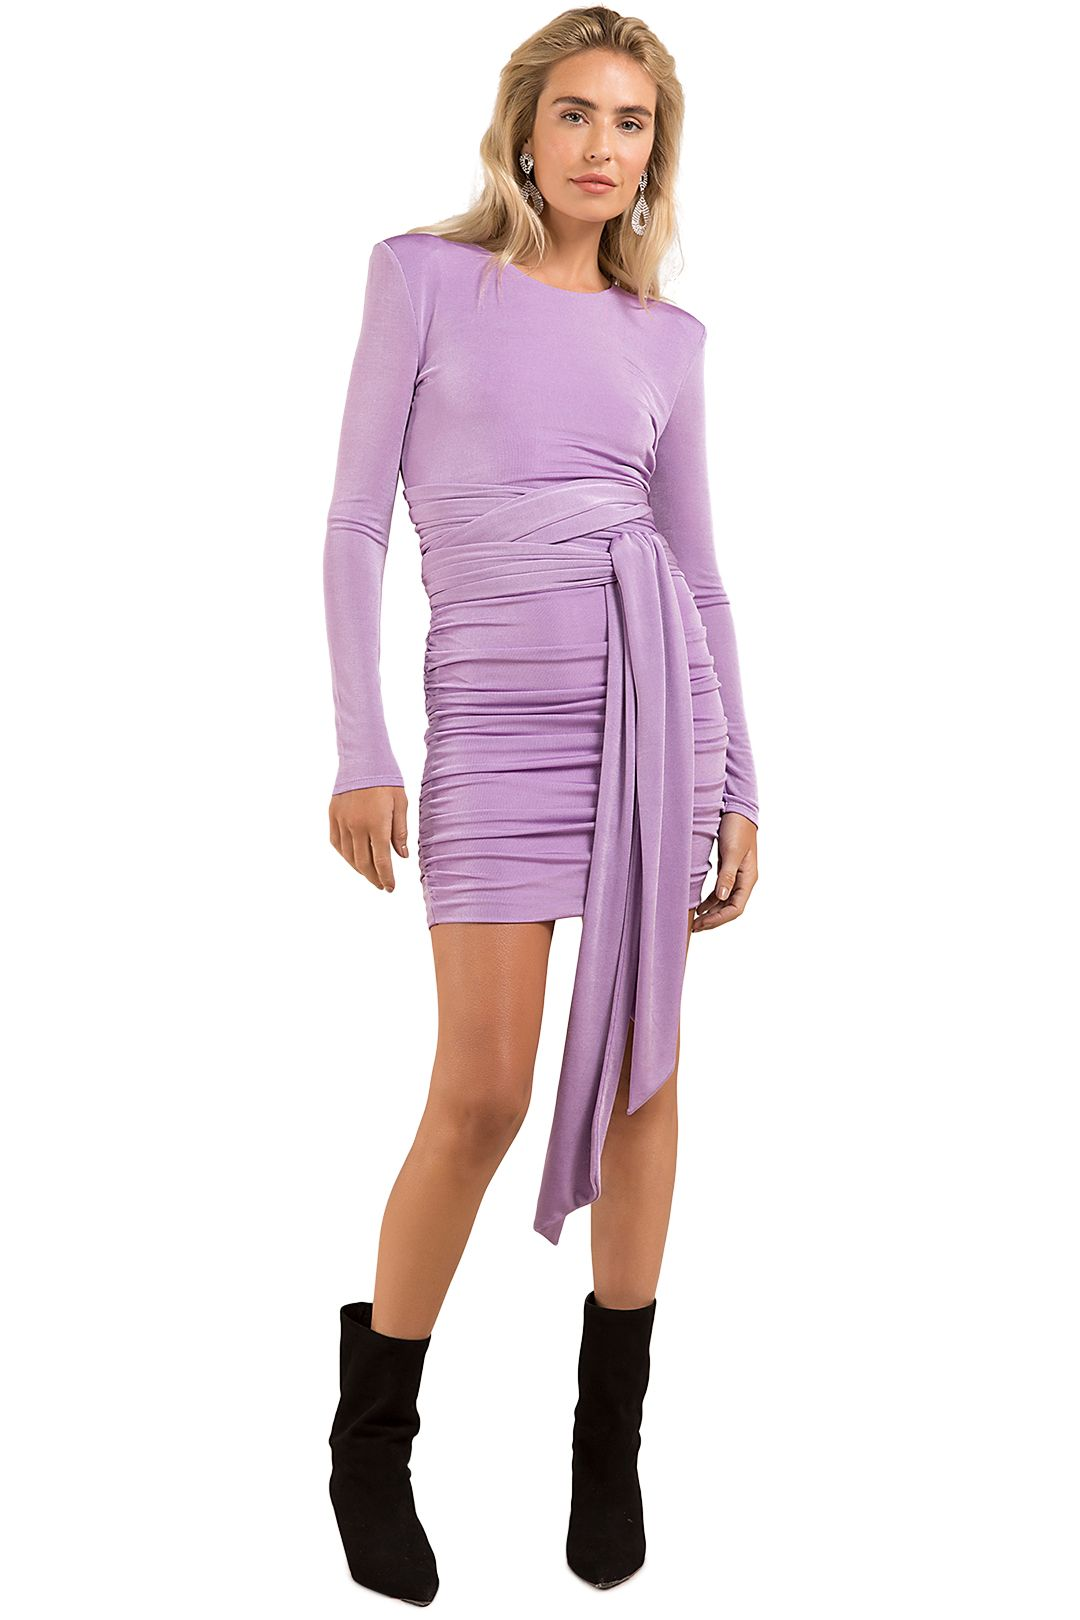 Misha-Winx-Dress-Lilac-Front